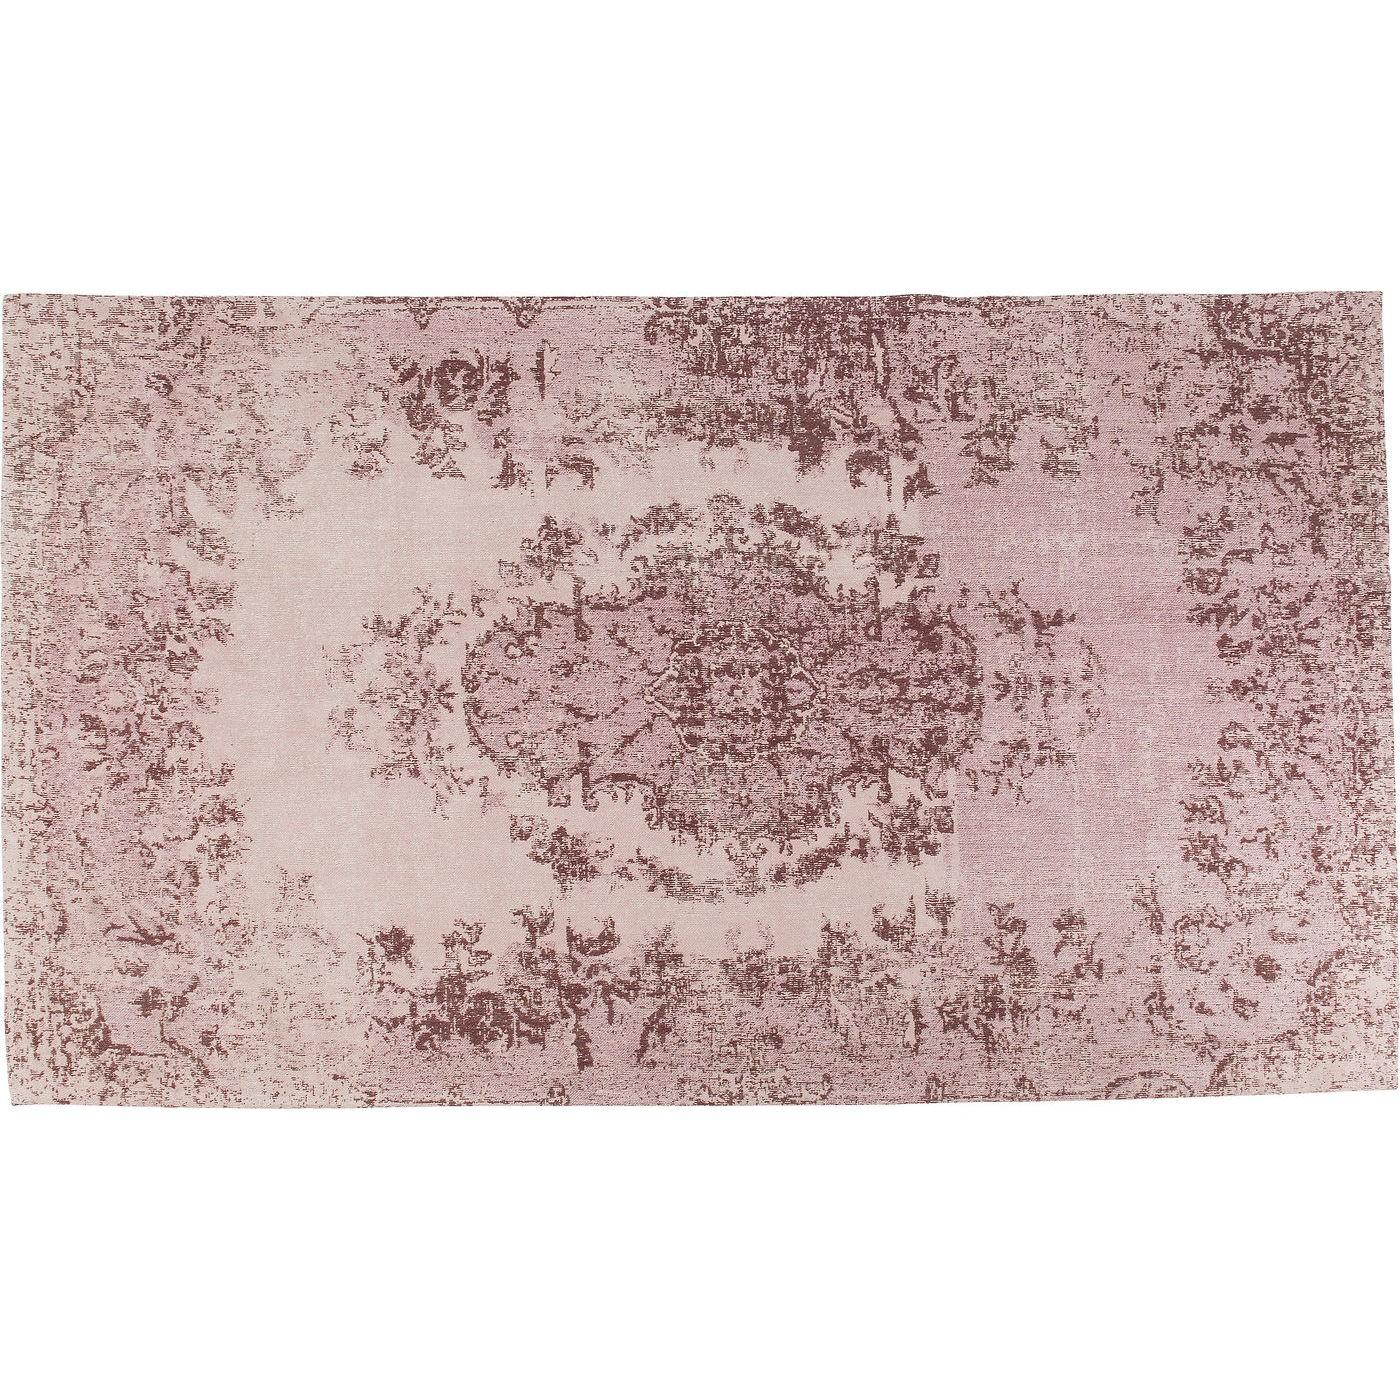 Tapis en coton rose 80x150